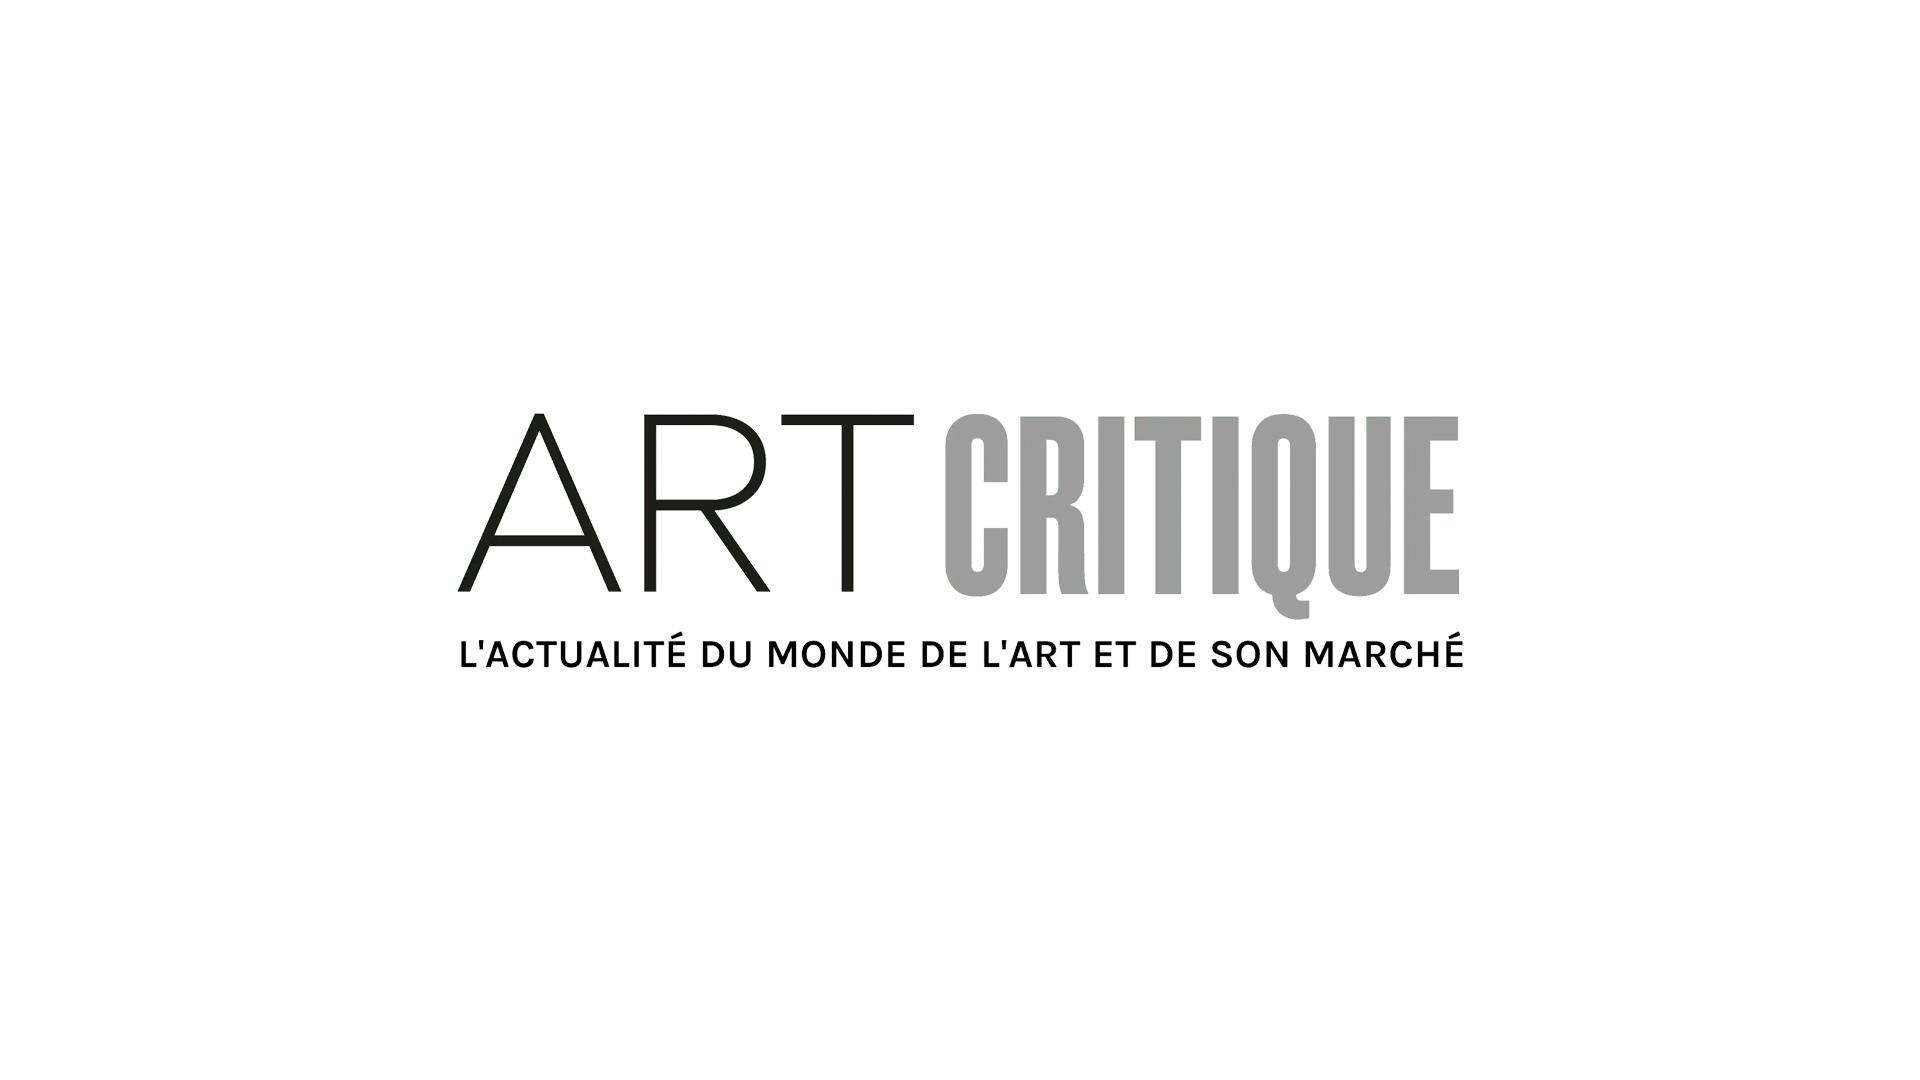 Berlin Museum of Islamic Art receives €9 million EUR donation from Saudi Arabian foundation